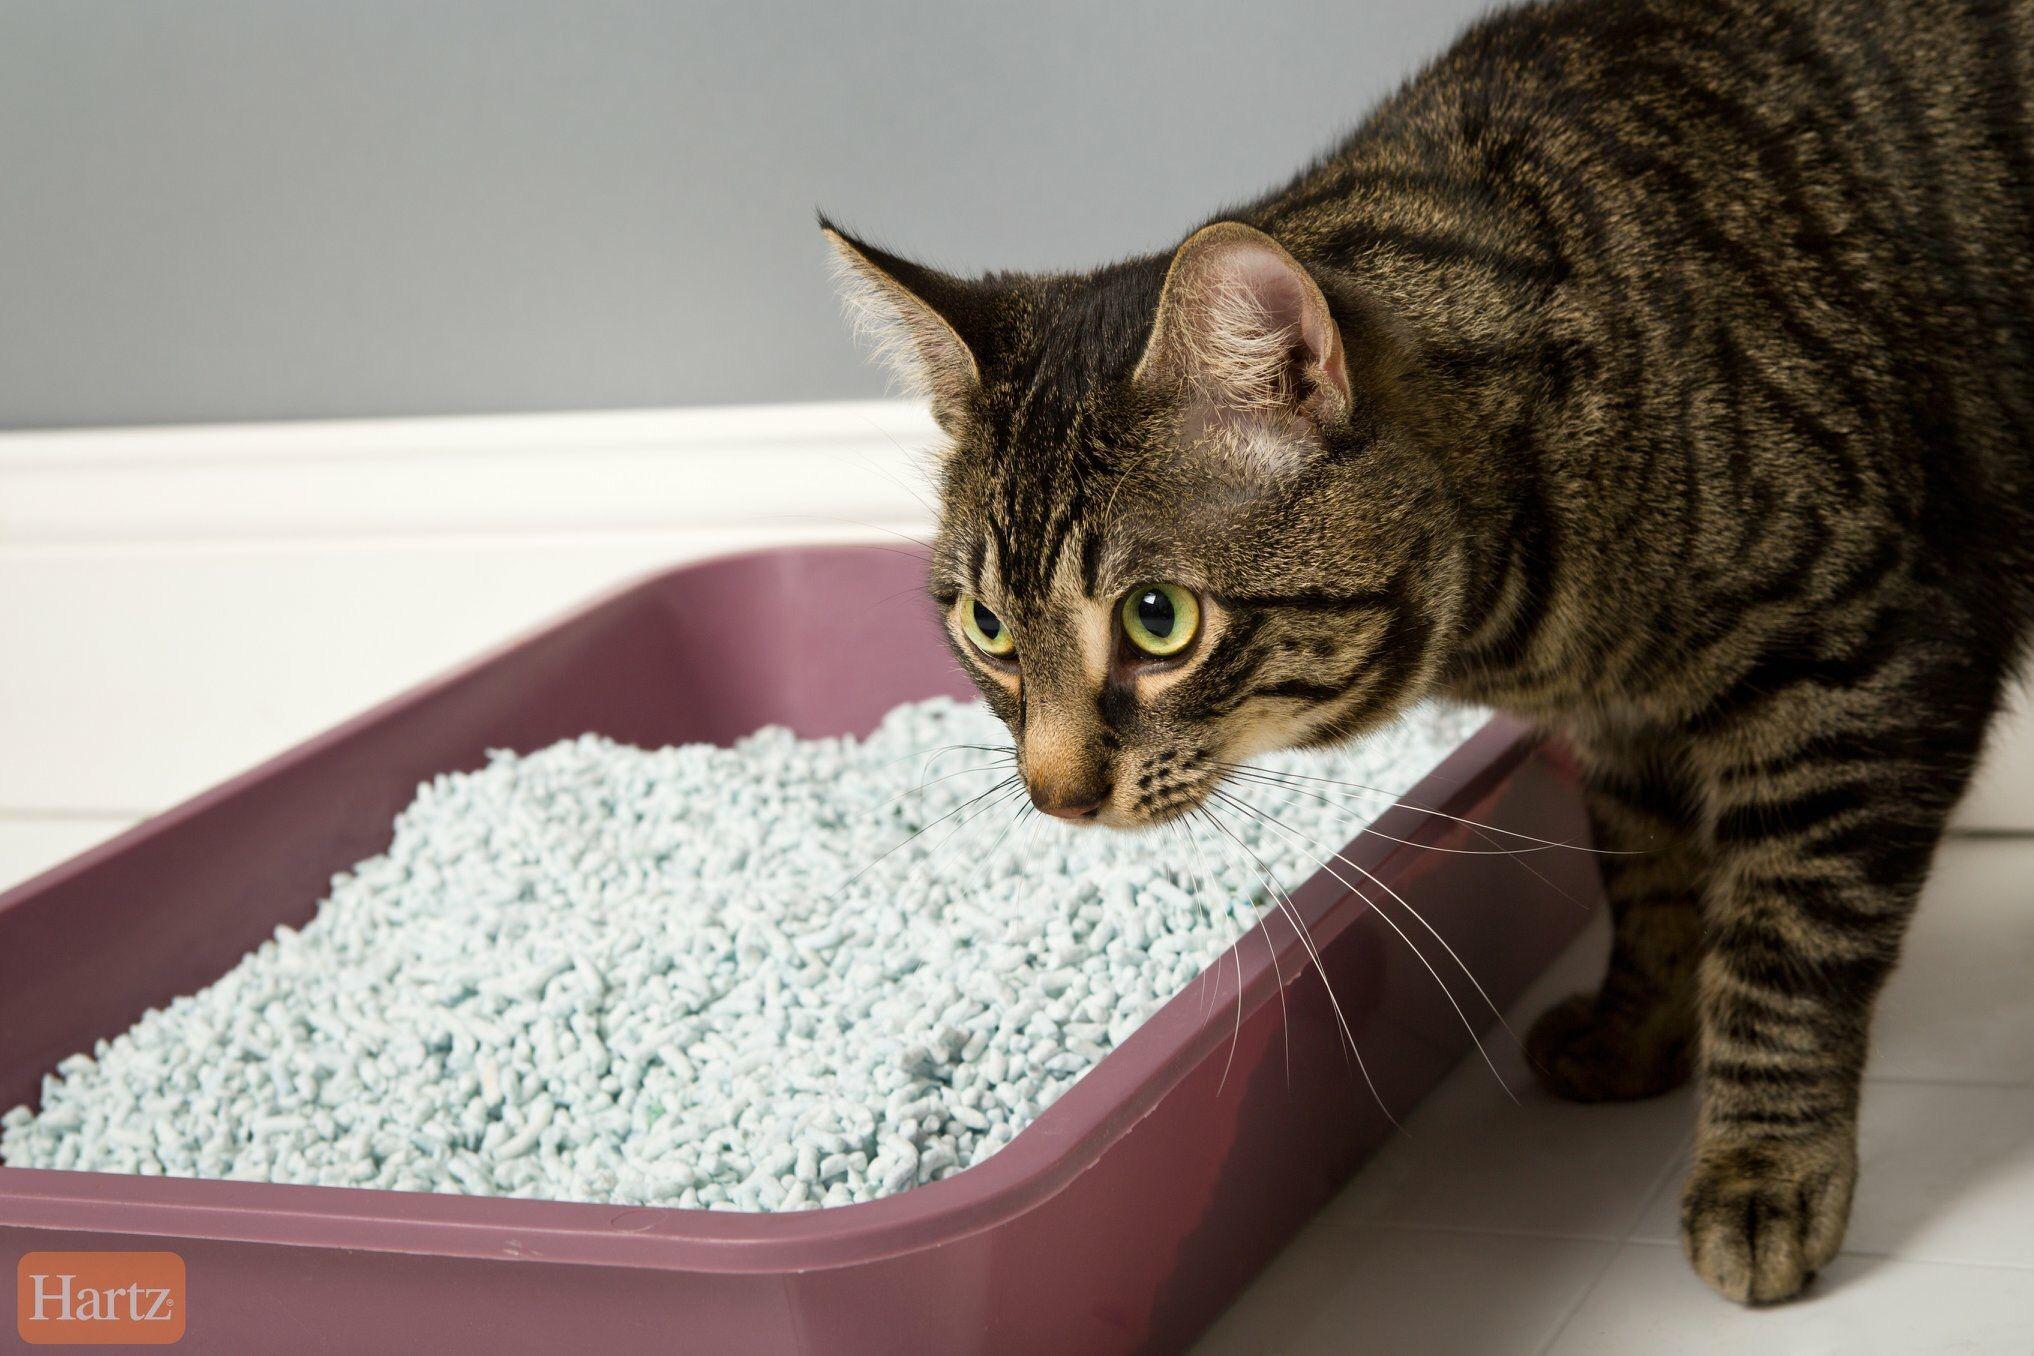 Amazon Com Hartz Multi Cat Lightweight Recycled Clumping Paper Cat Litter Cat Litter Paper Cat Litter Best Cat Litter